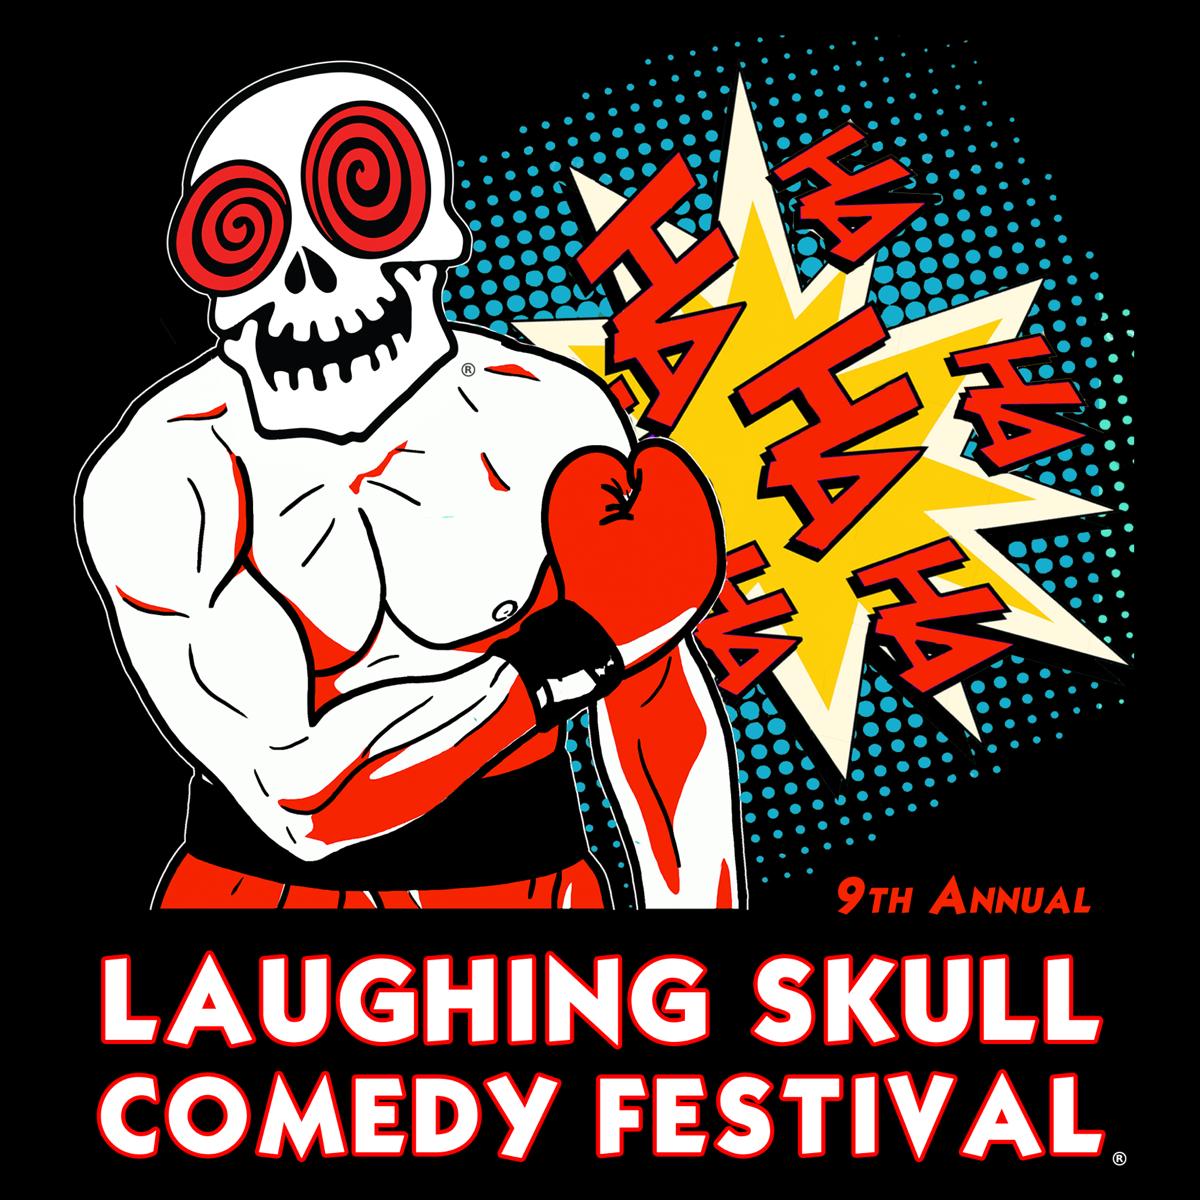 The 9th Annual Laughing Skull Comedy Festival — Saturday 10:30pm Show at Red Light Café — April 28, 2018 — Red Light Café, Atlanta, GA